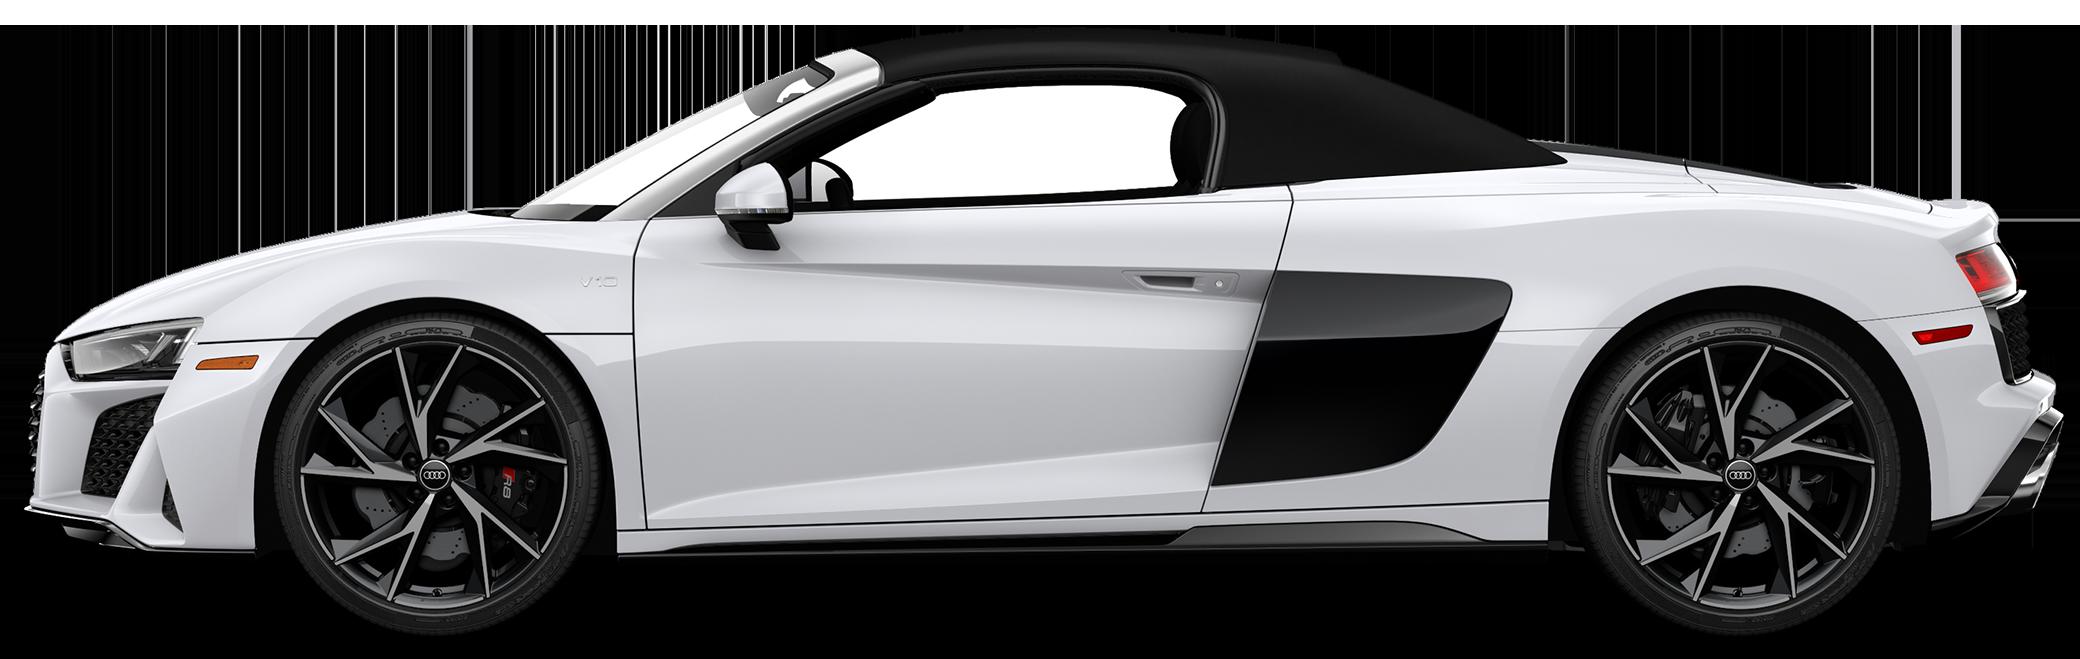 2022 Audi R8 Spyder 5.2 V10 performance